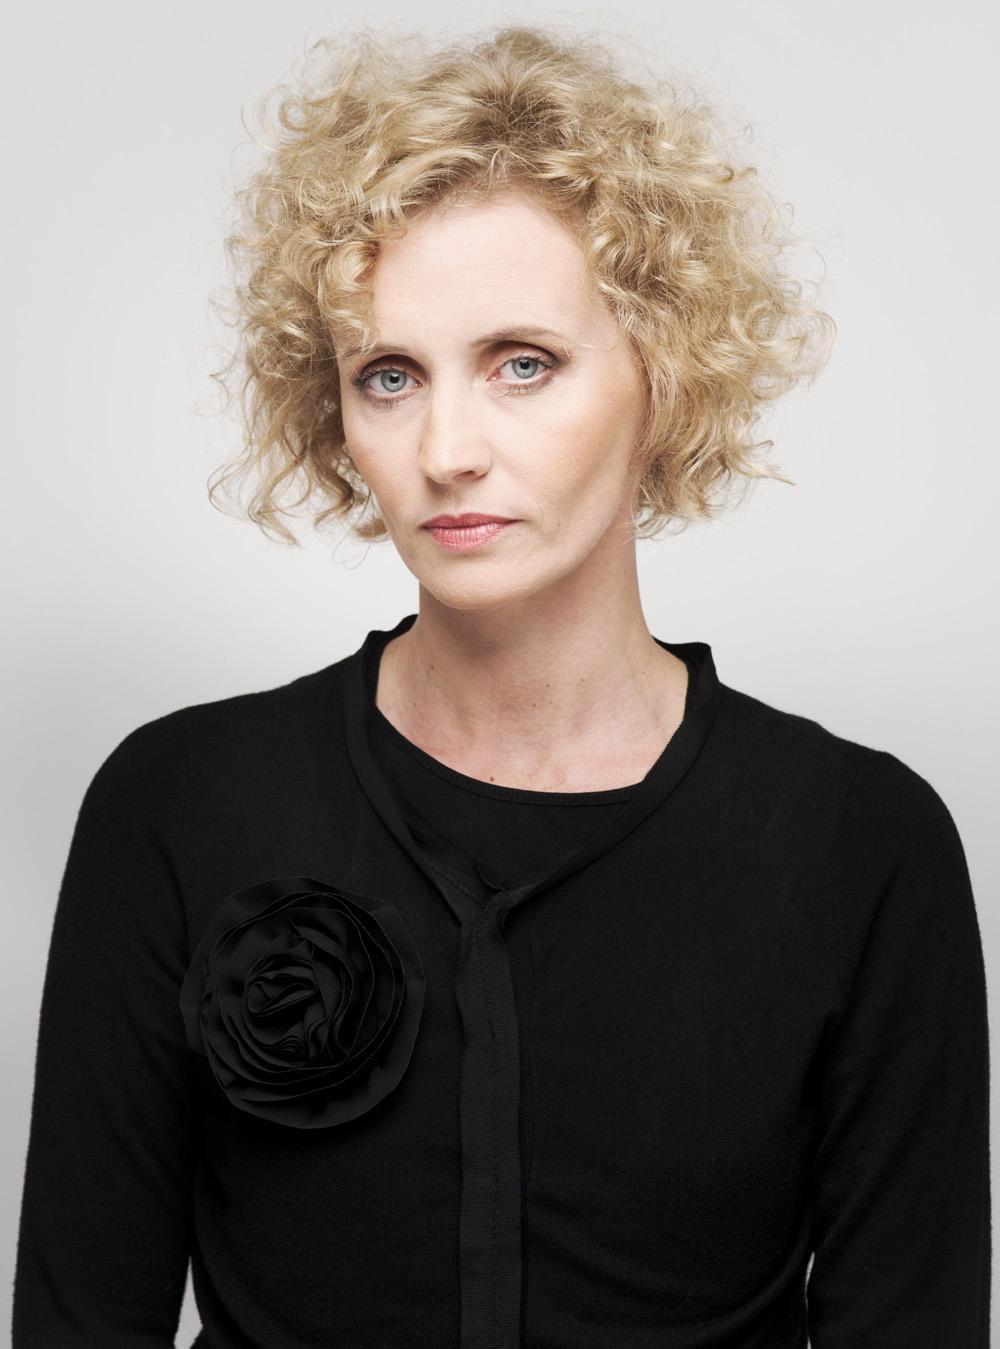 Agnieszka Korytkowska-Mazur, fot. Bartek Warzecha